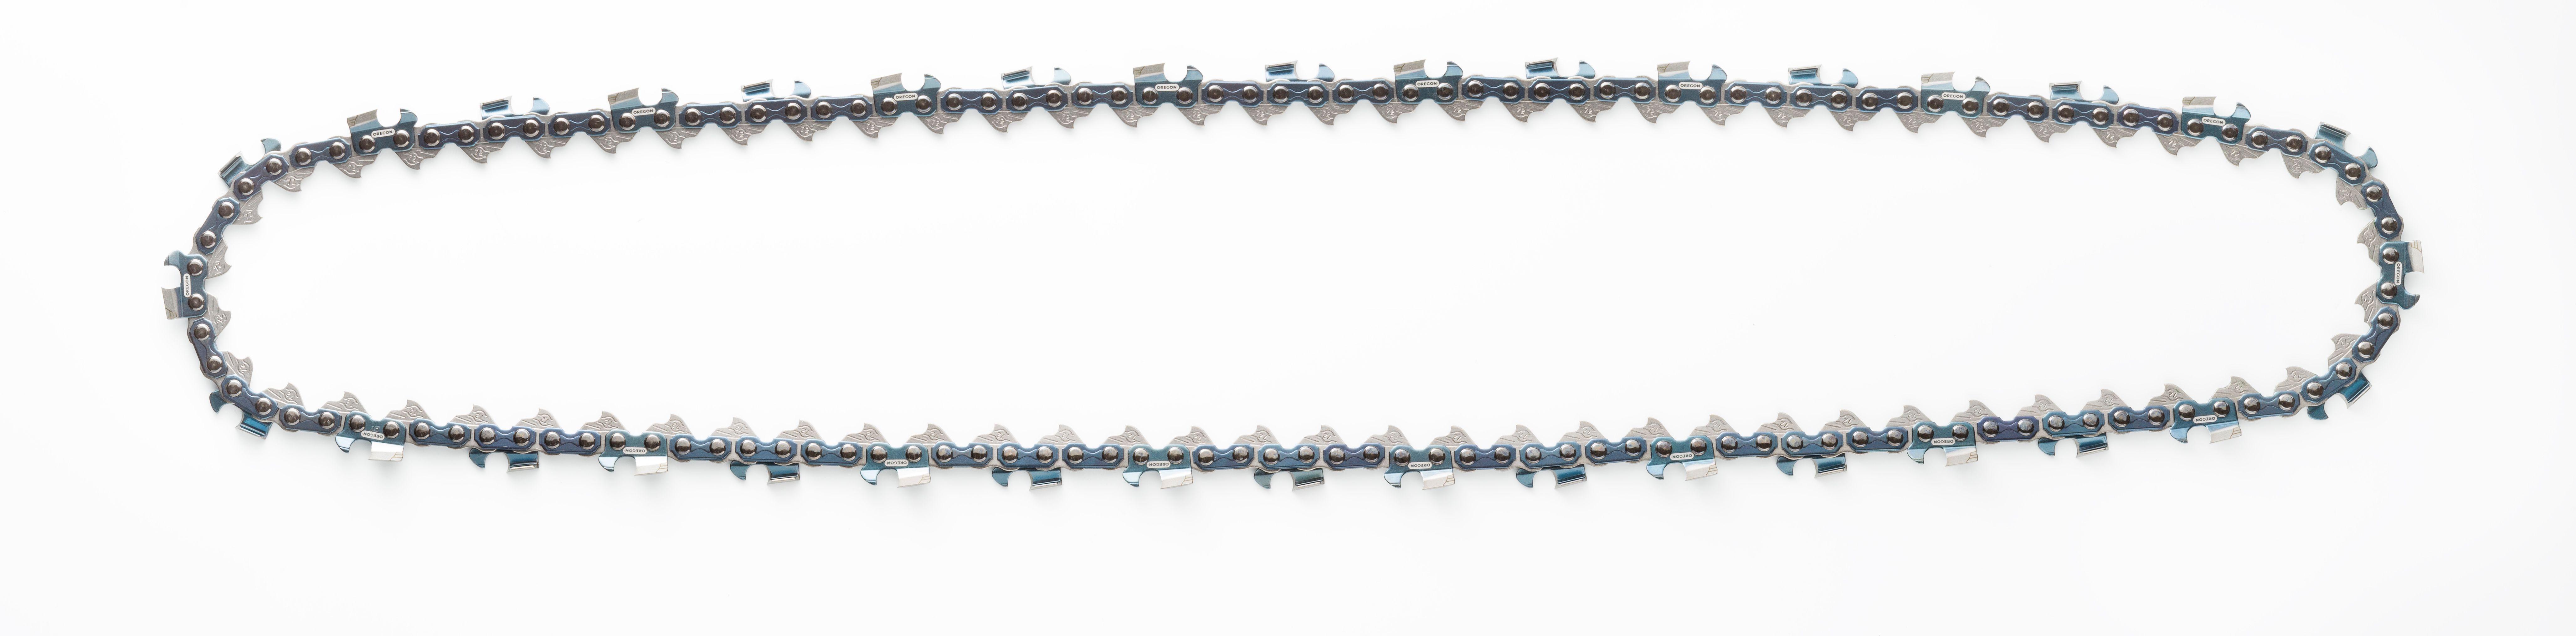 "3//8/"" Oregon 73EXL072G 72 Drive Links Powercut Full Chisel Pitch Saw Chain Gauge"